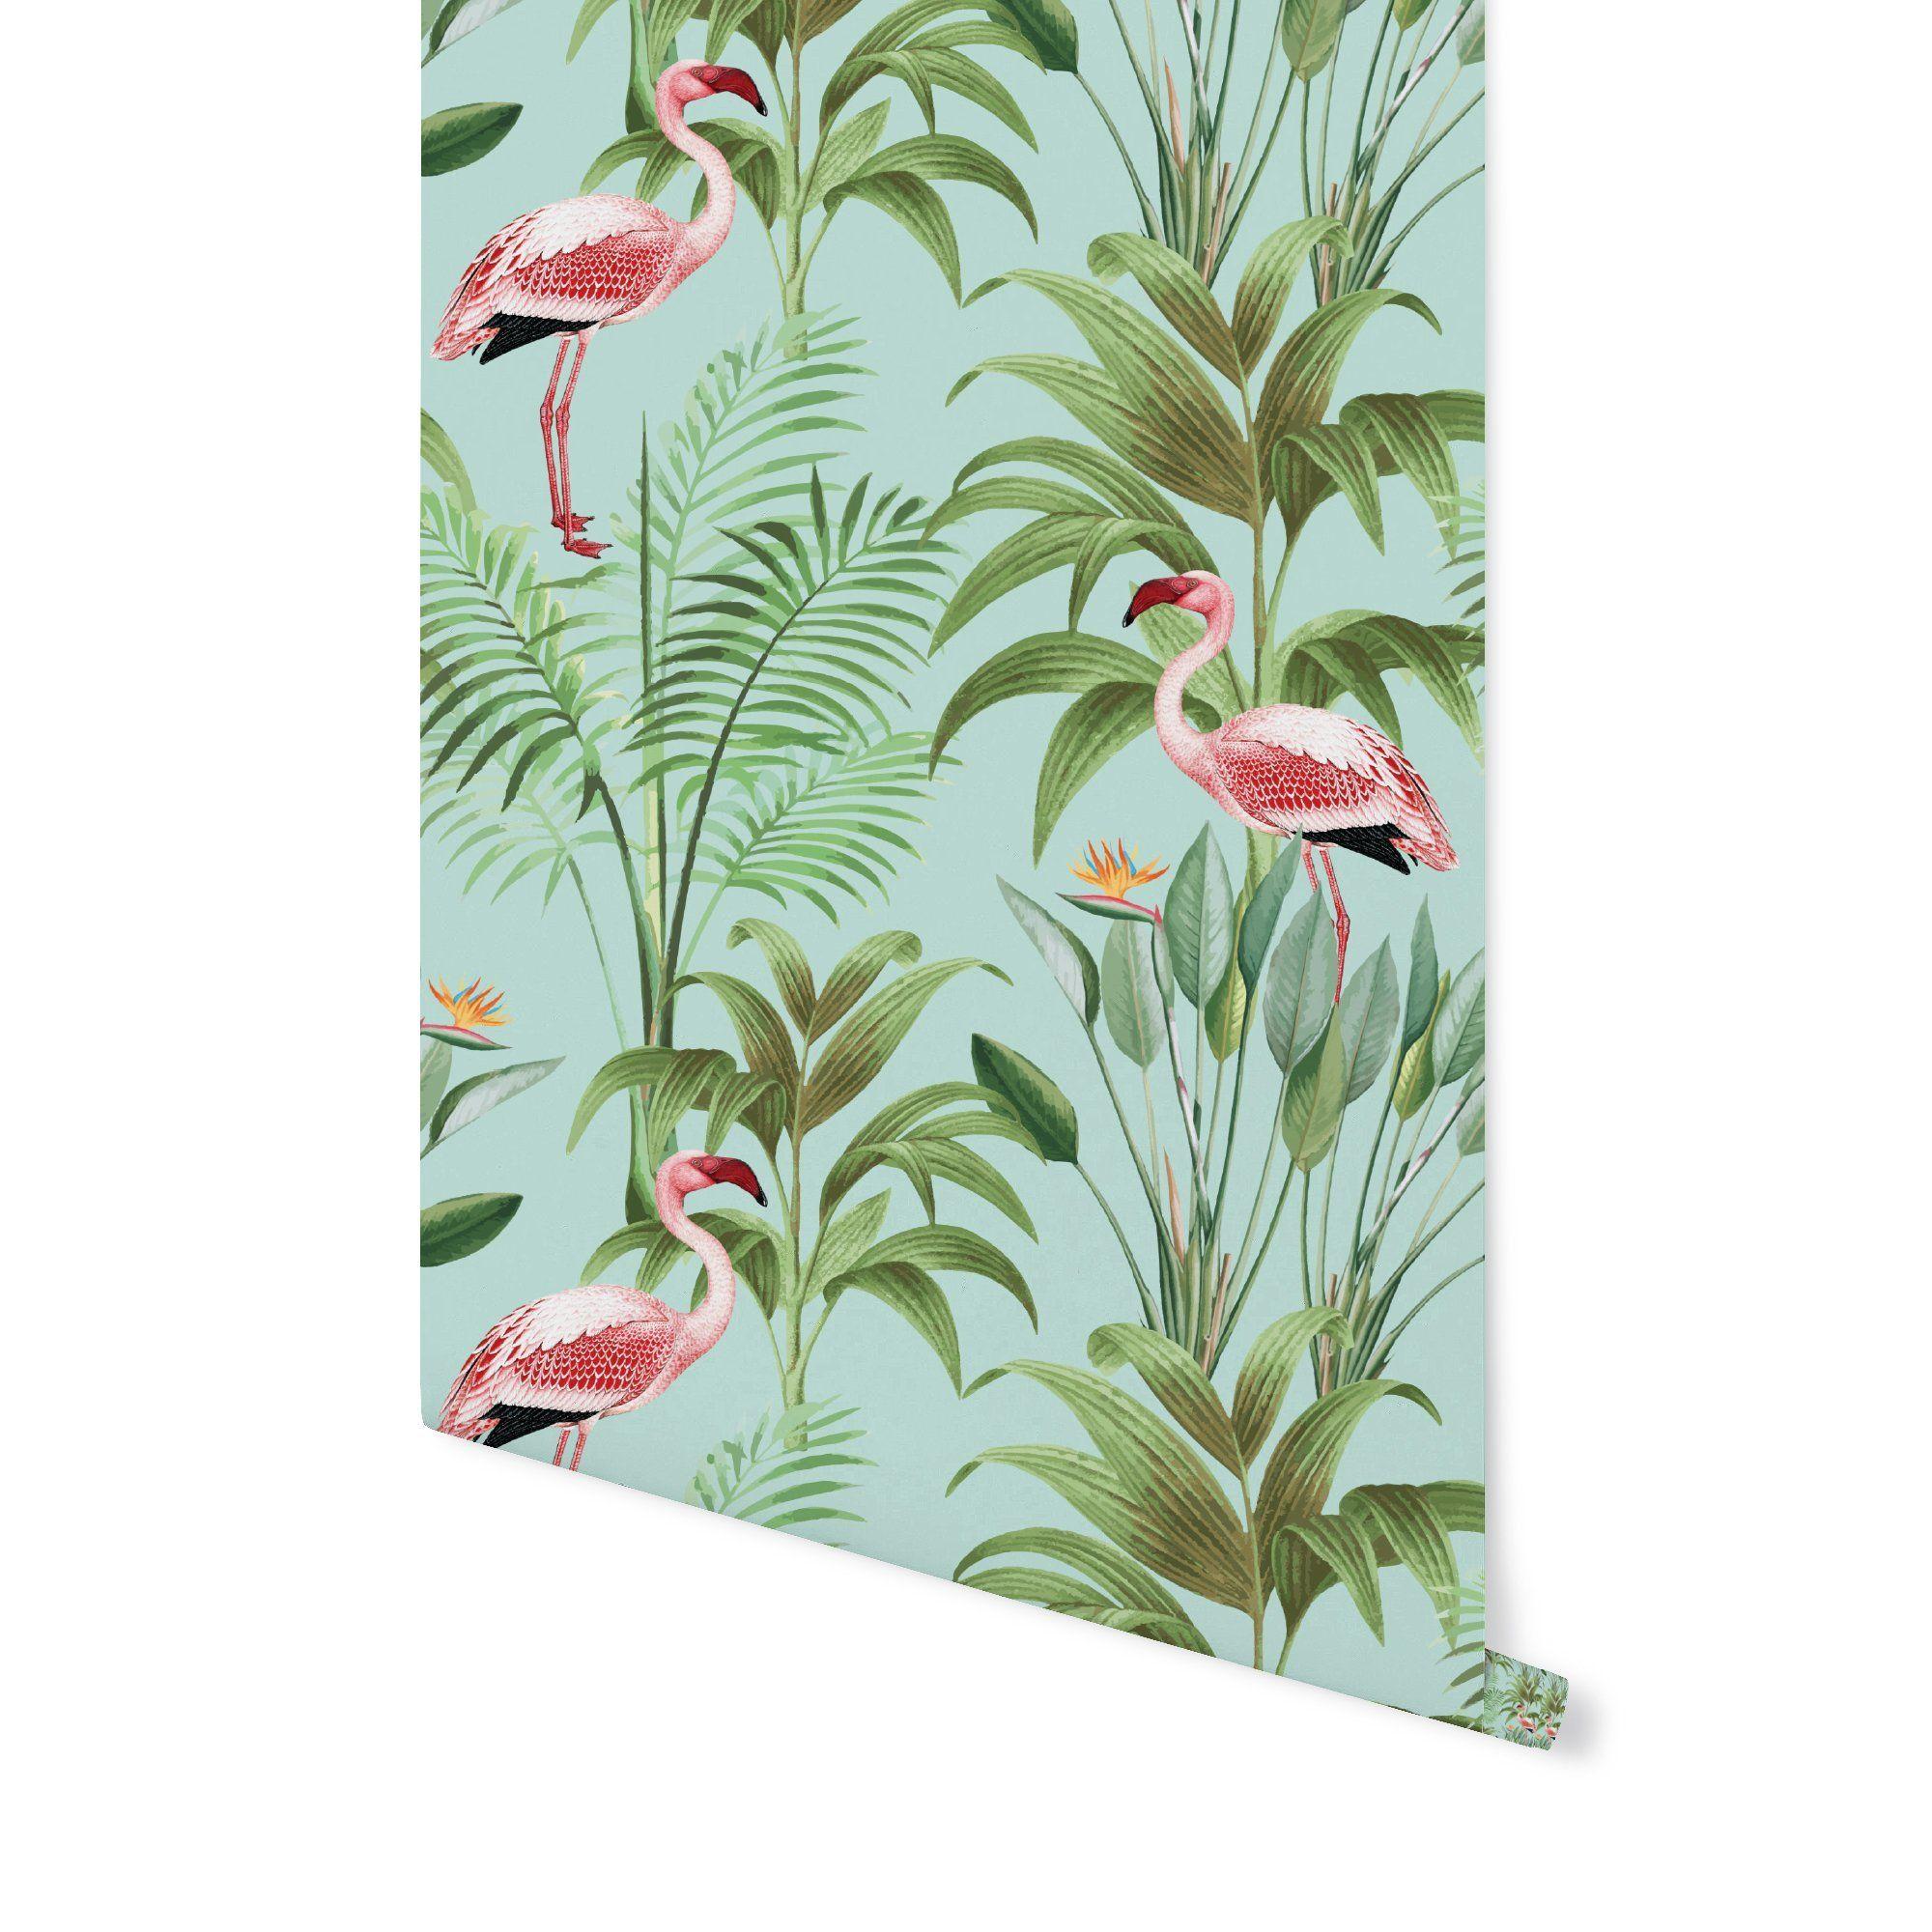 Tropical Flamingo Flamingo Wallpaper Peel And Stick Wallpaper Tropical